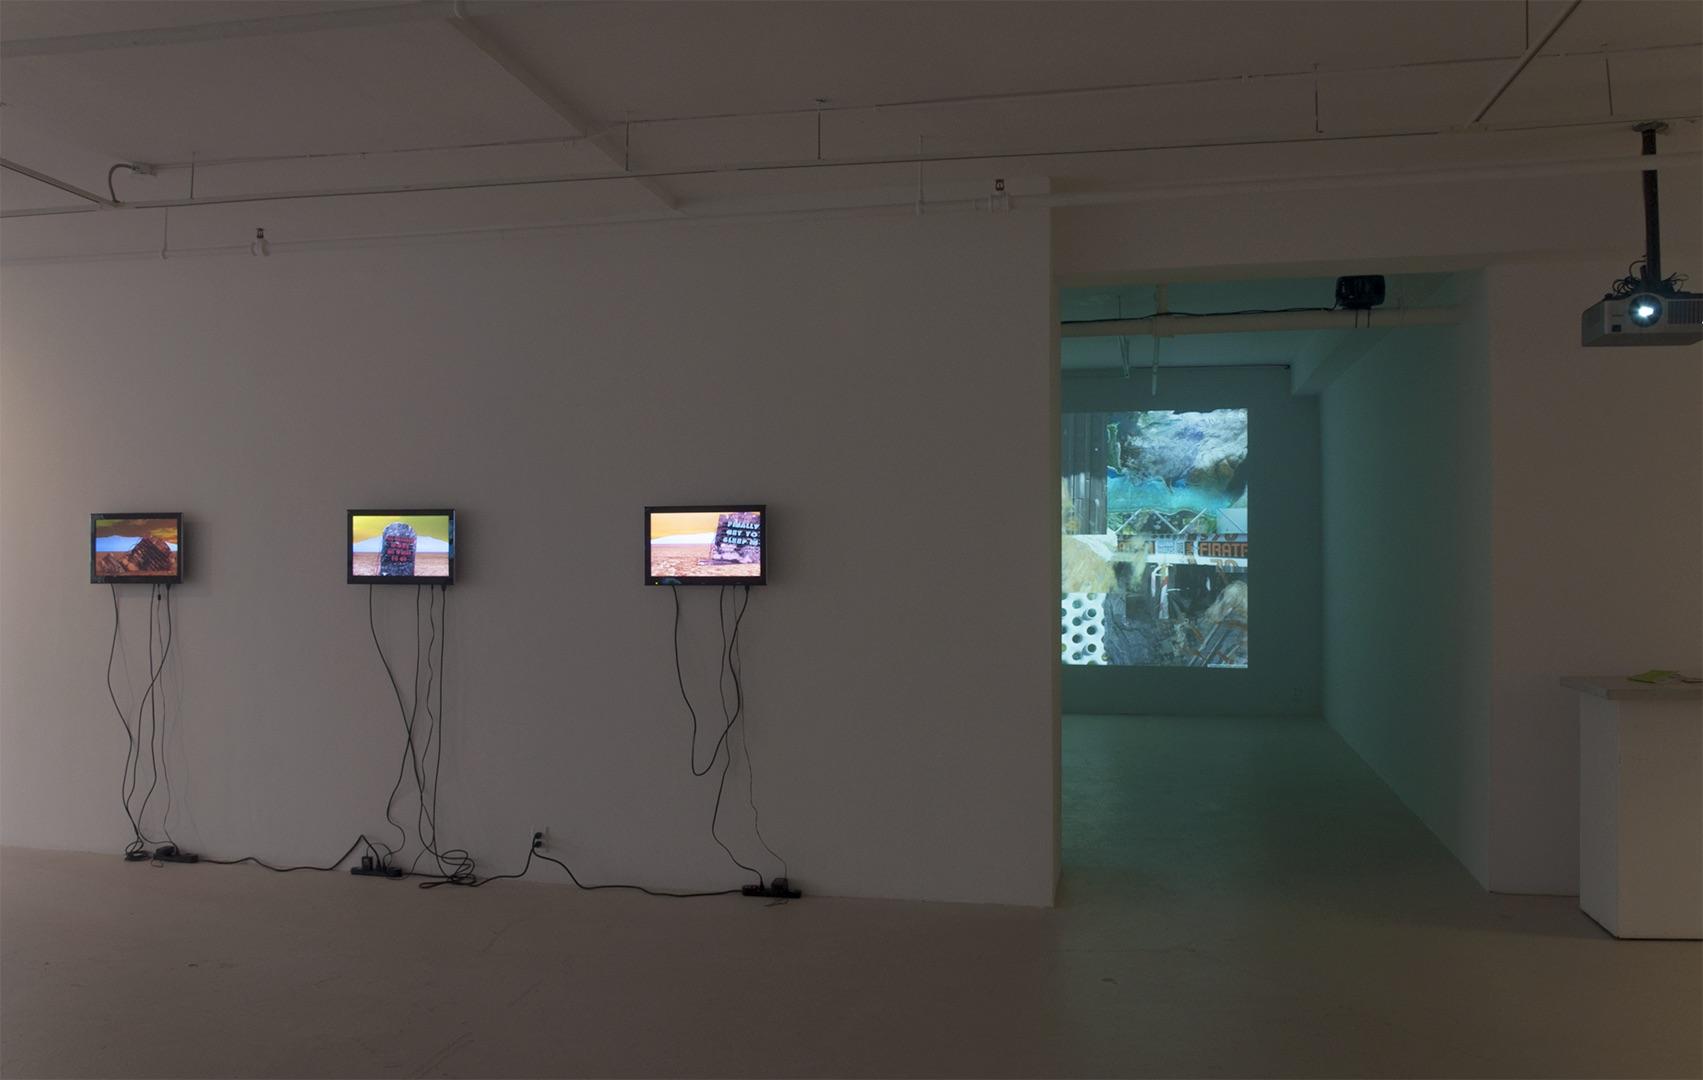 Neon Land , Brianna Lowe, 2014 // Indirect Flights , Joe Hamilton, 2015